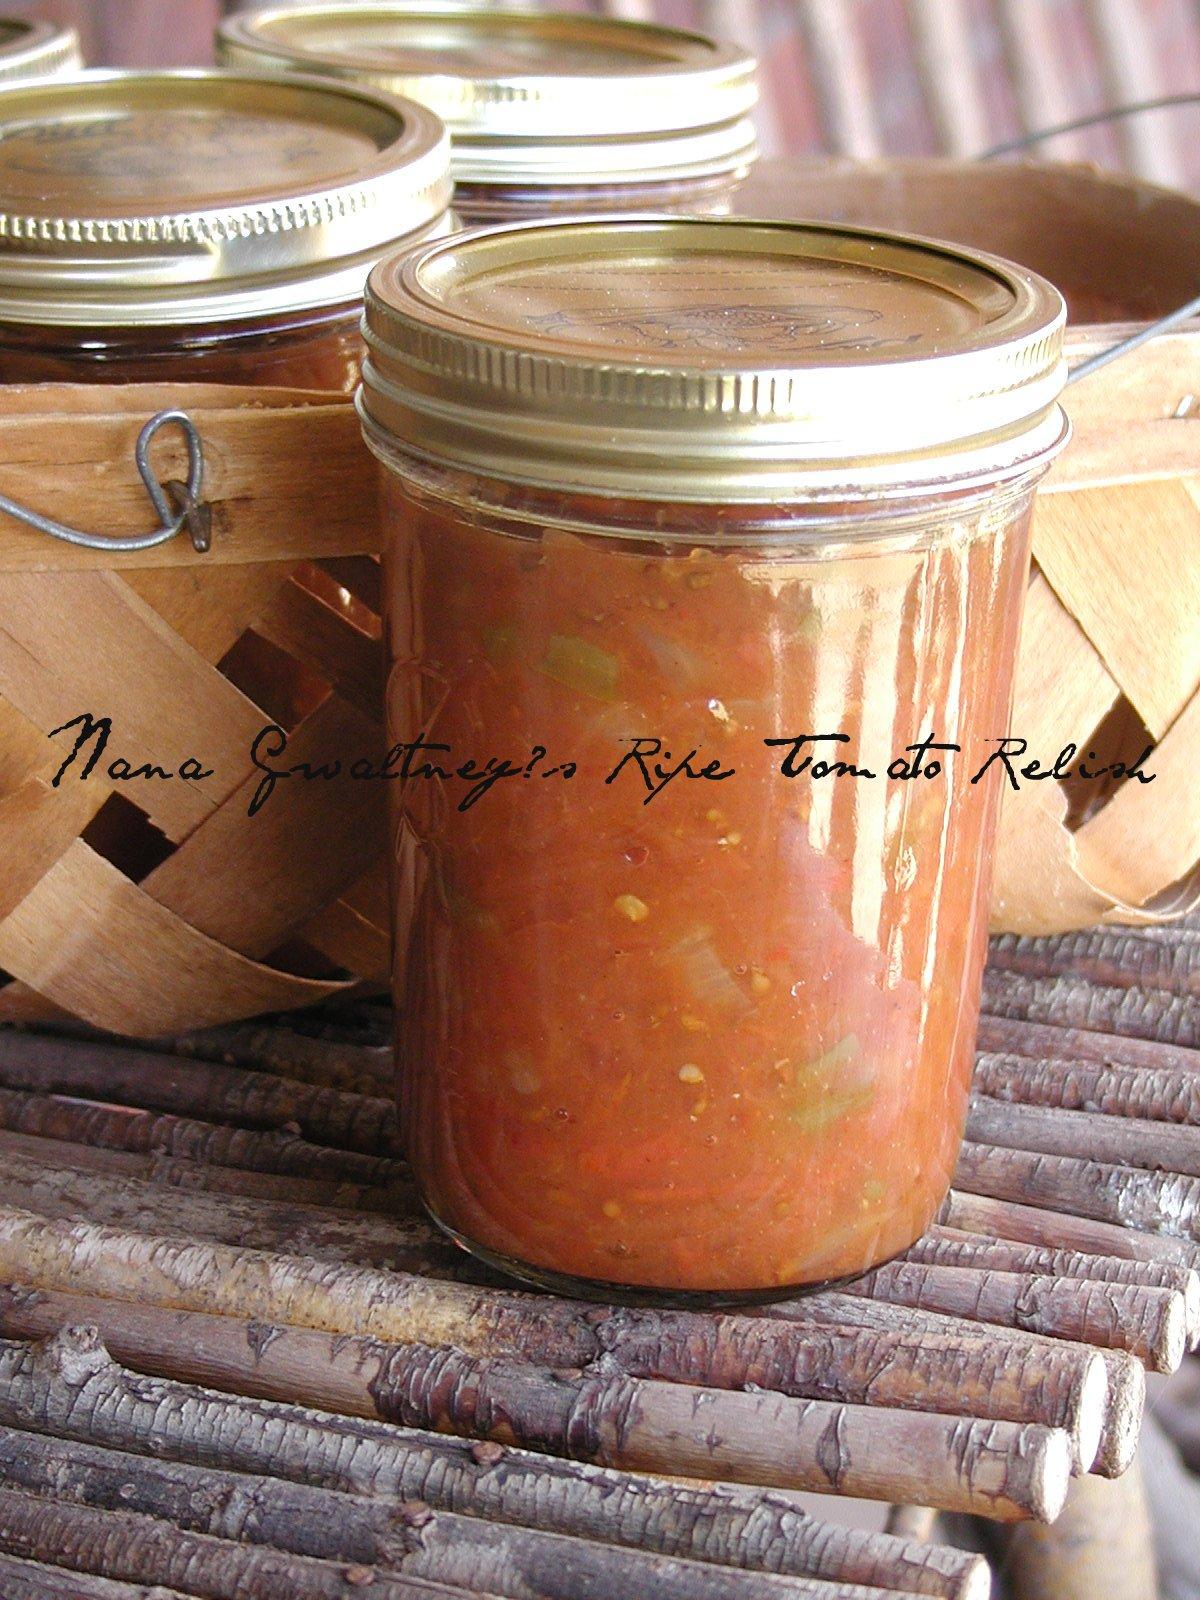 Nana Gwaltney\'s Ripe Tomato Relish, A Very Wonderful Oooold Recipe